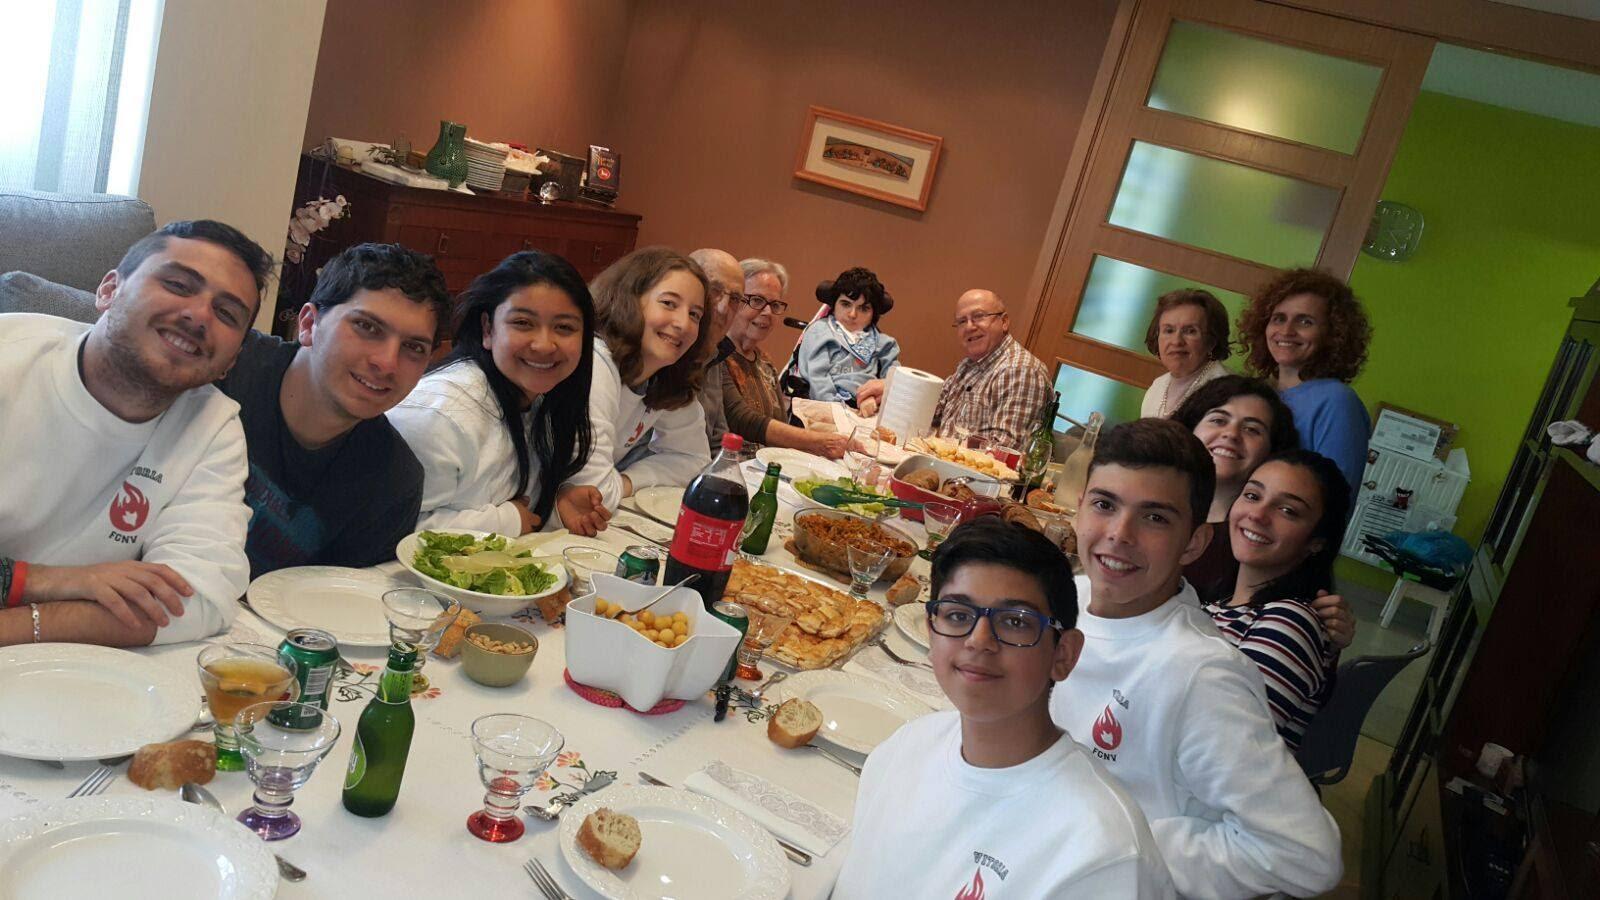 2017.04.13-16 - Pascua Jovenes SdJ (120)